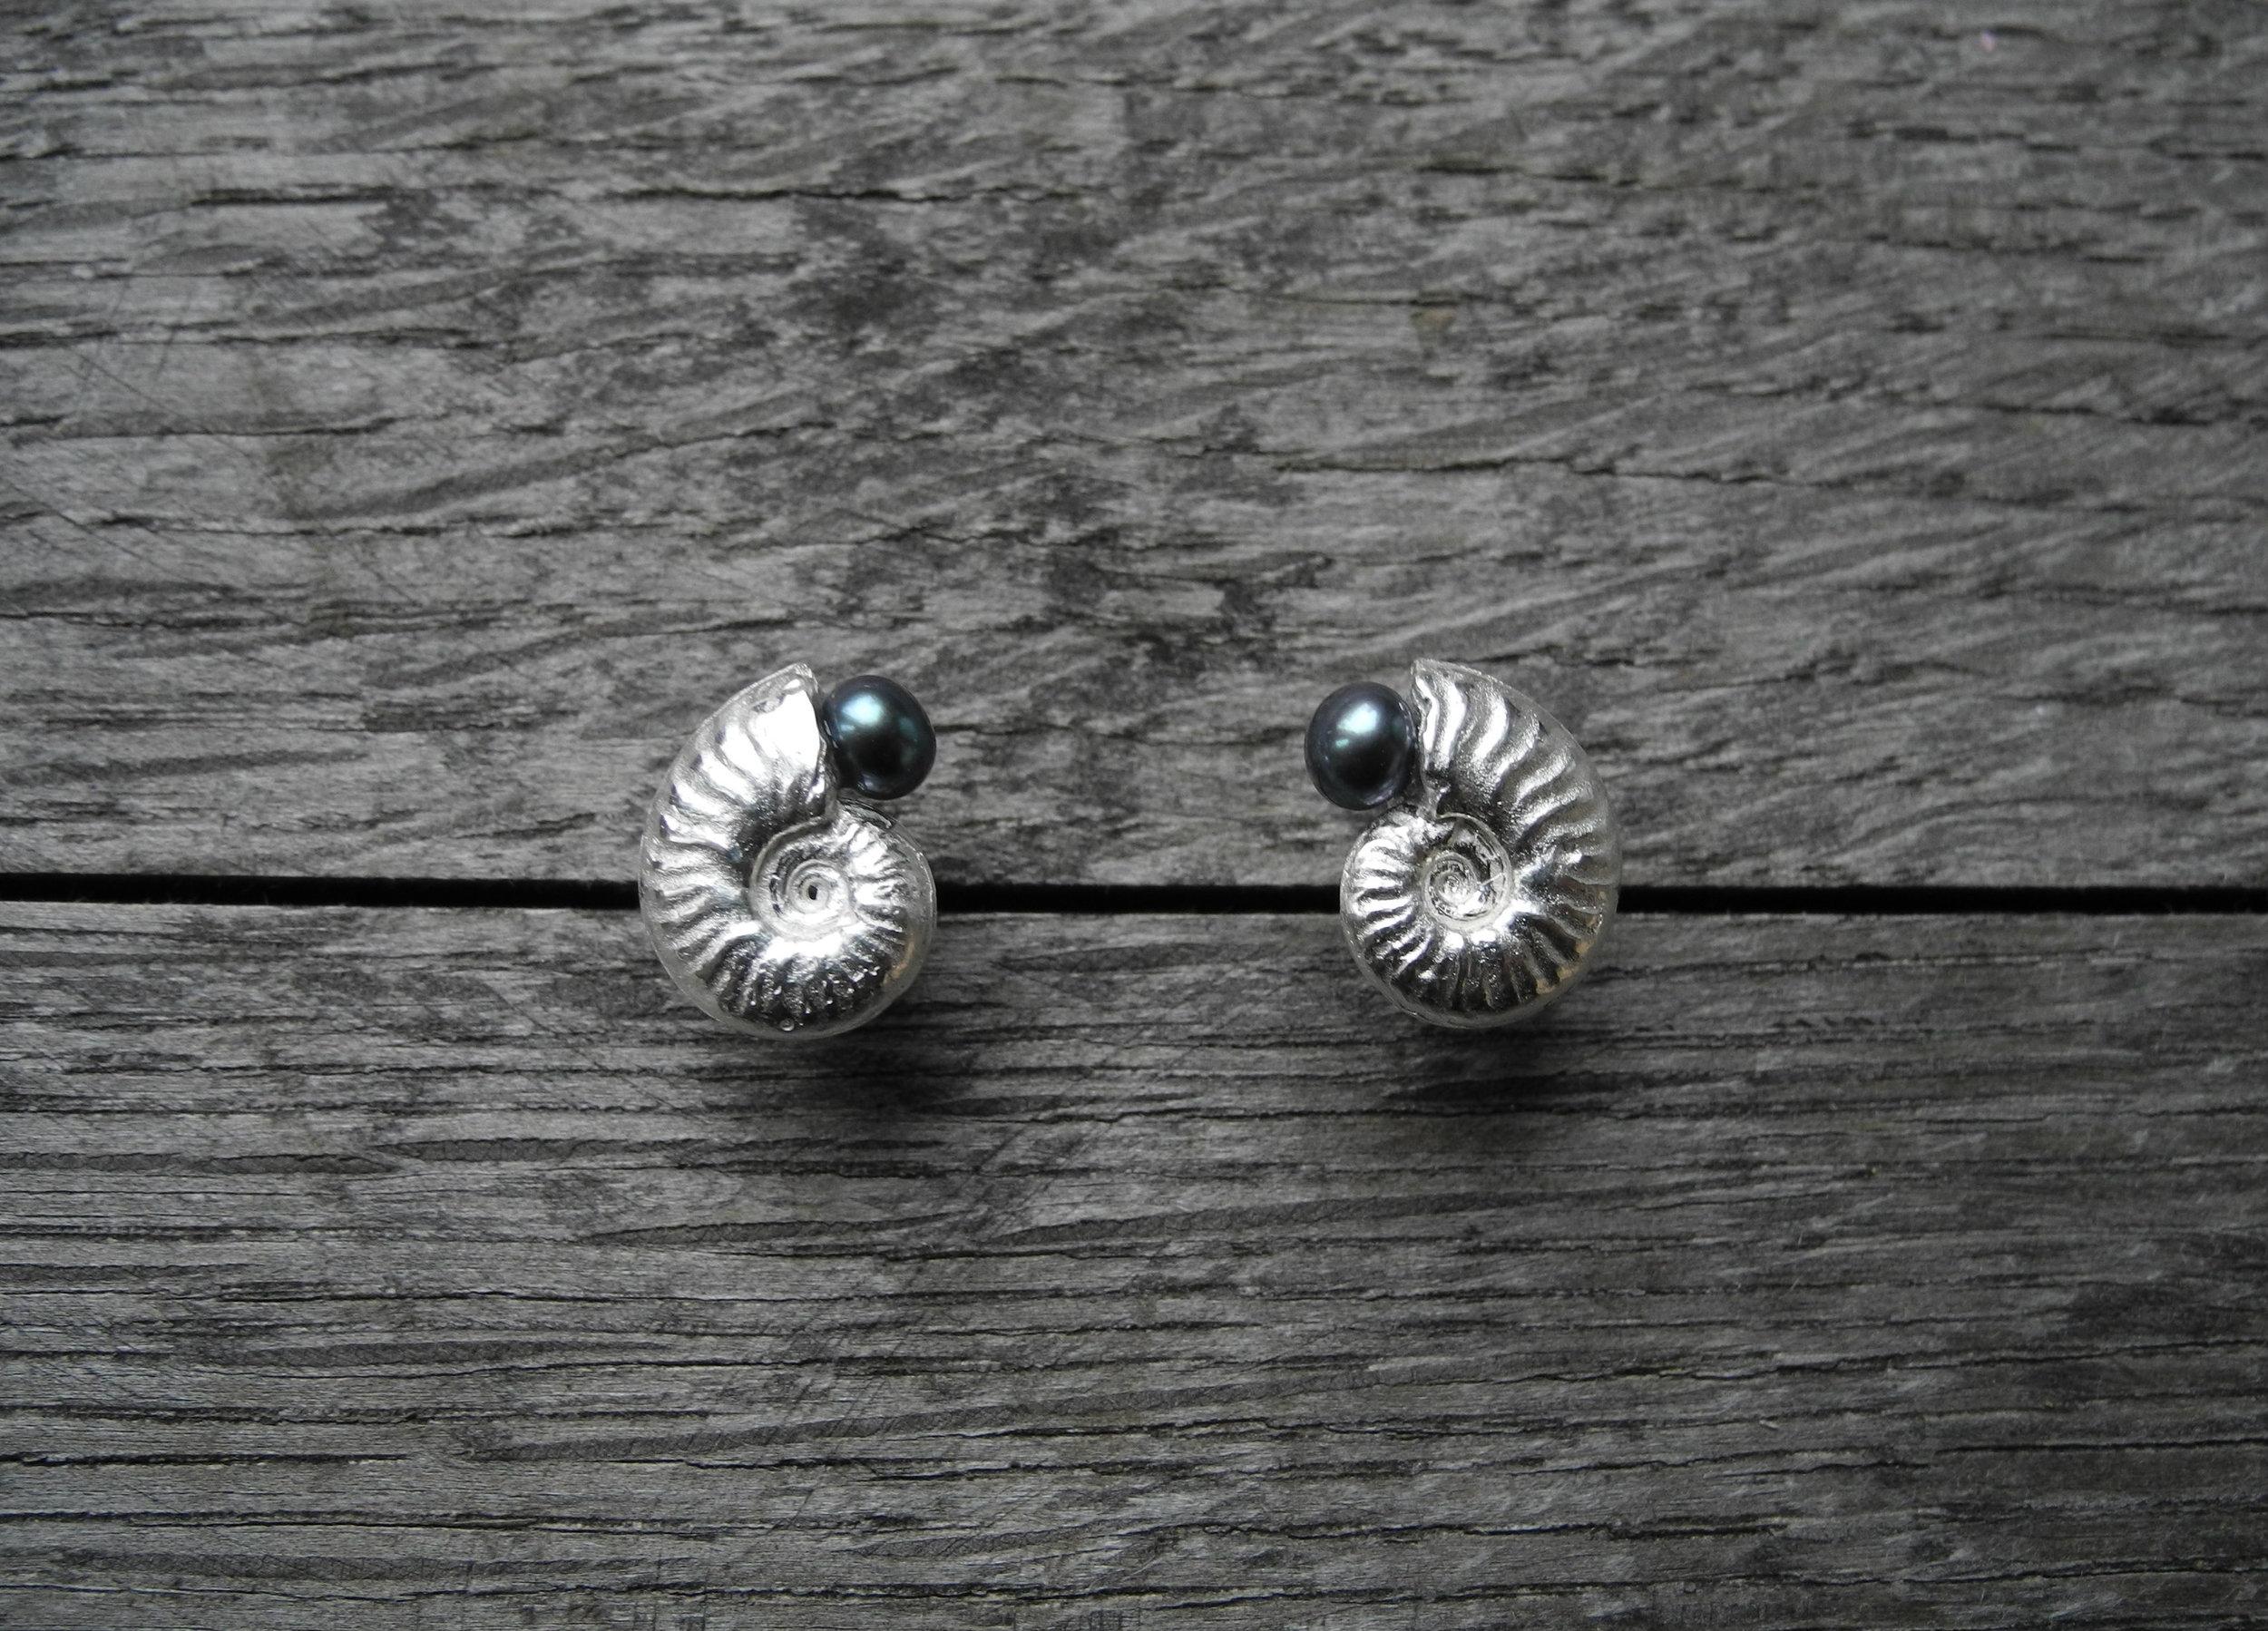 Ammonit m dkl.Perle.jpg